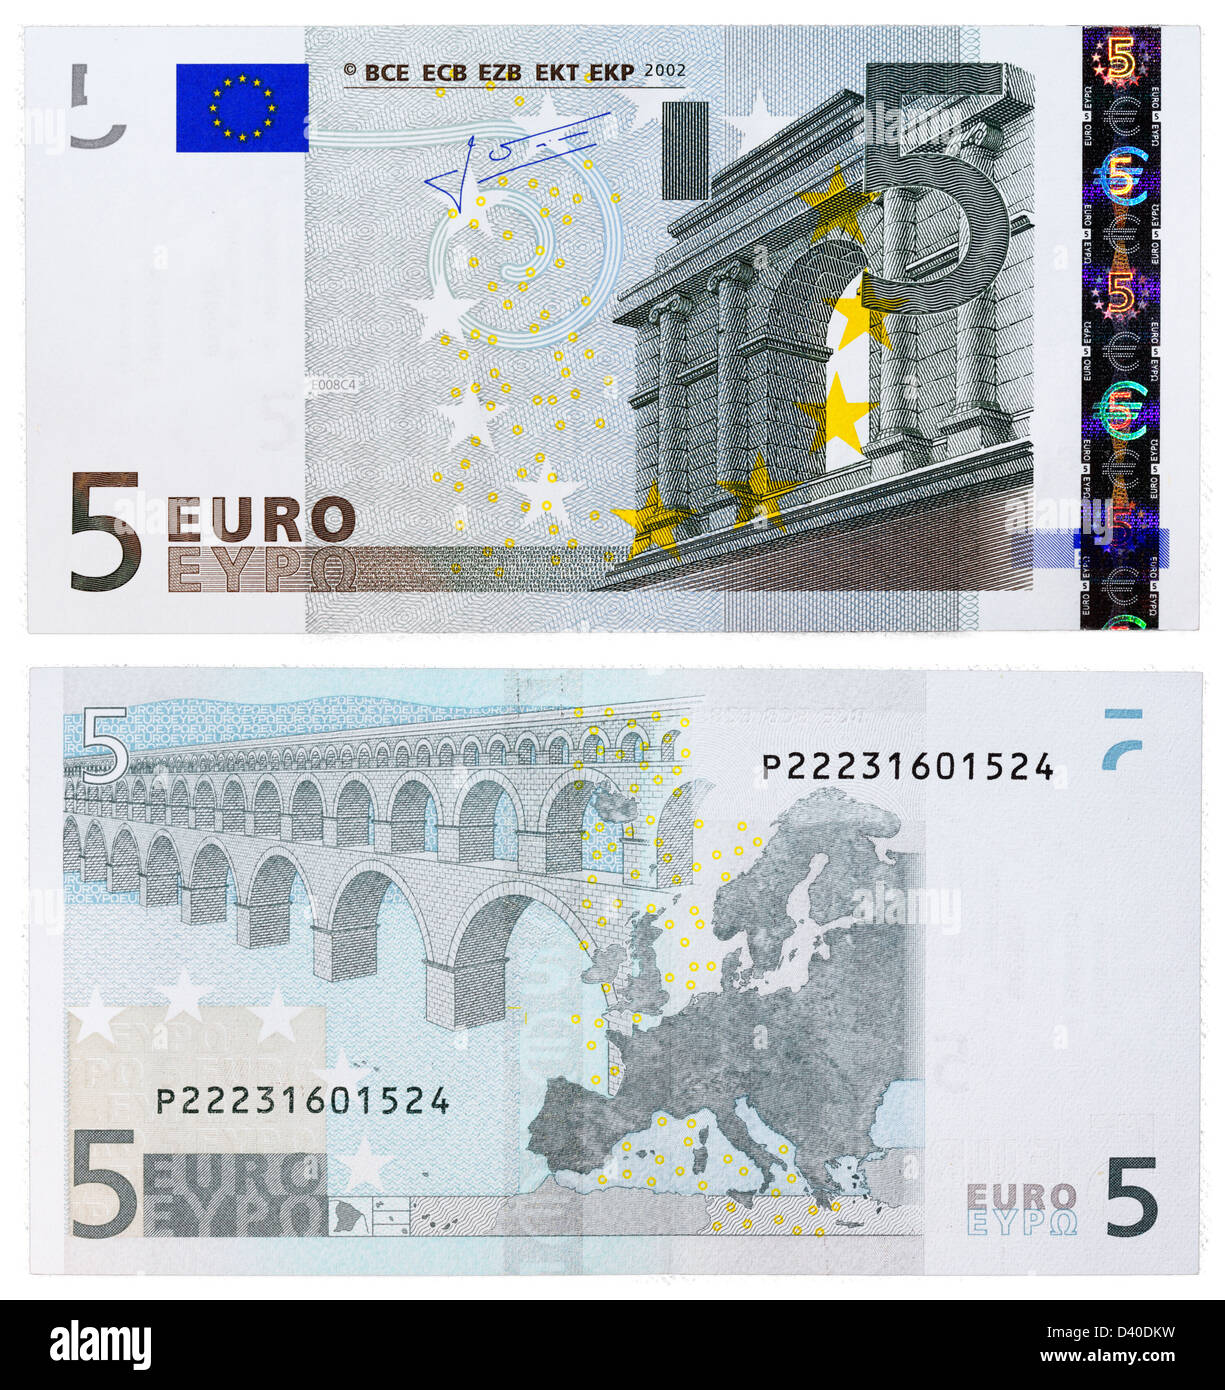 5 Euro Banknote Classical Architecture And Bridge 2002